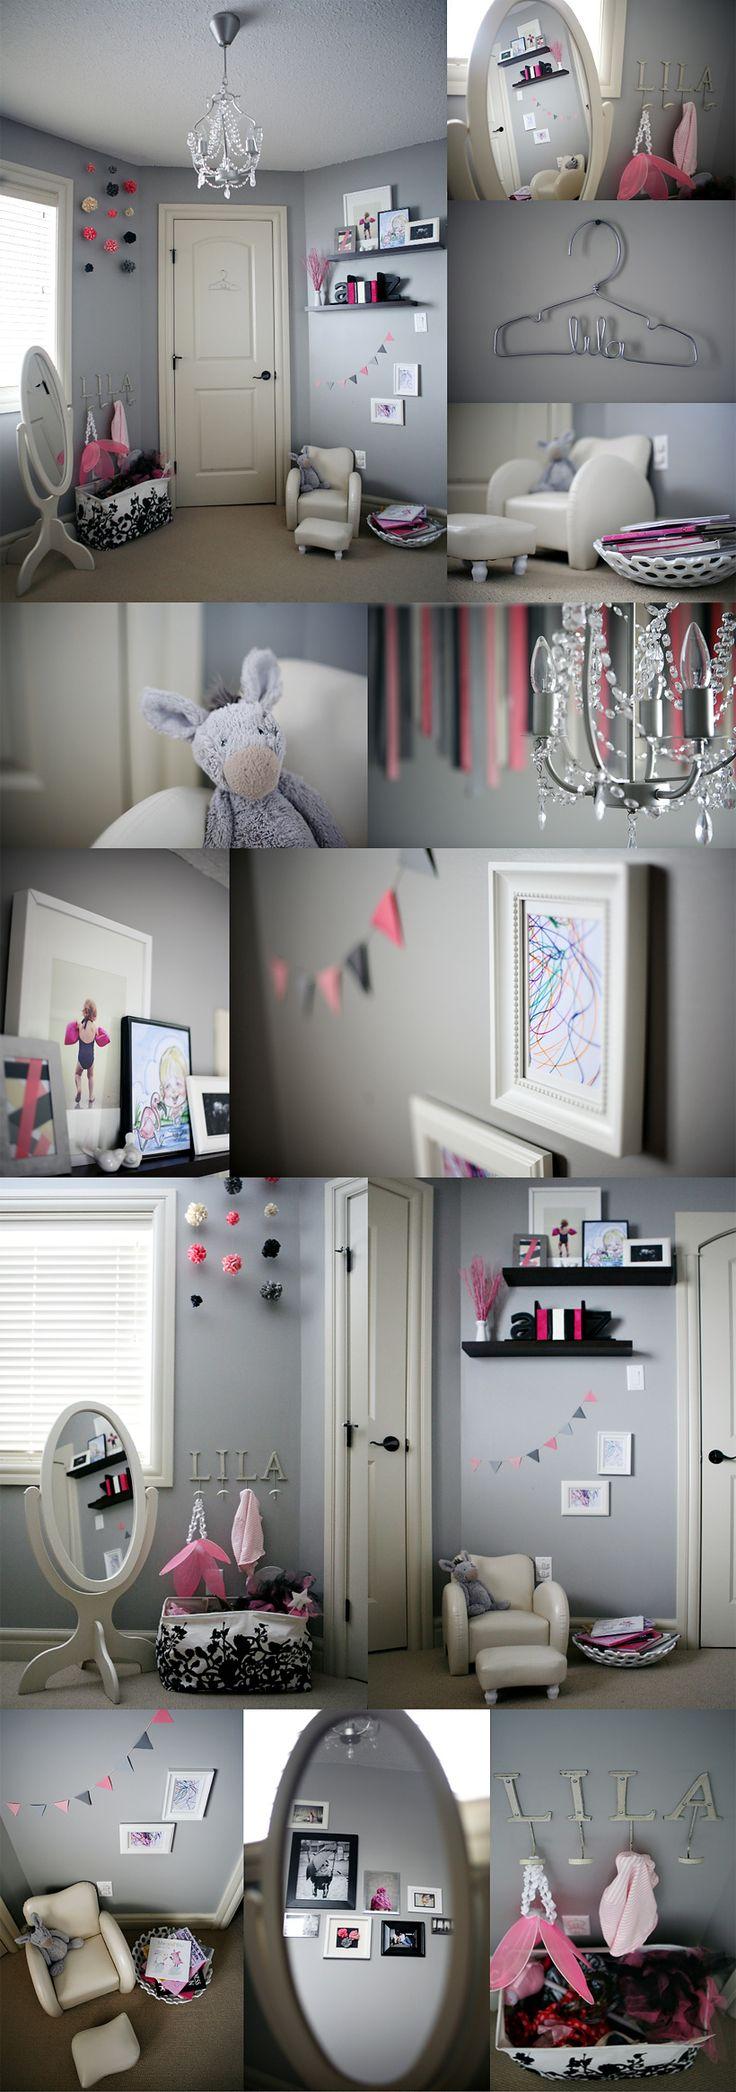 Little girls room, frames, dress up corner, reading chair etc all cute